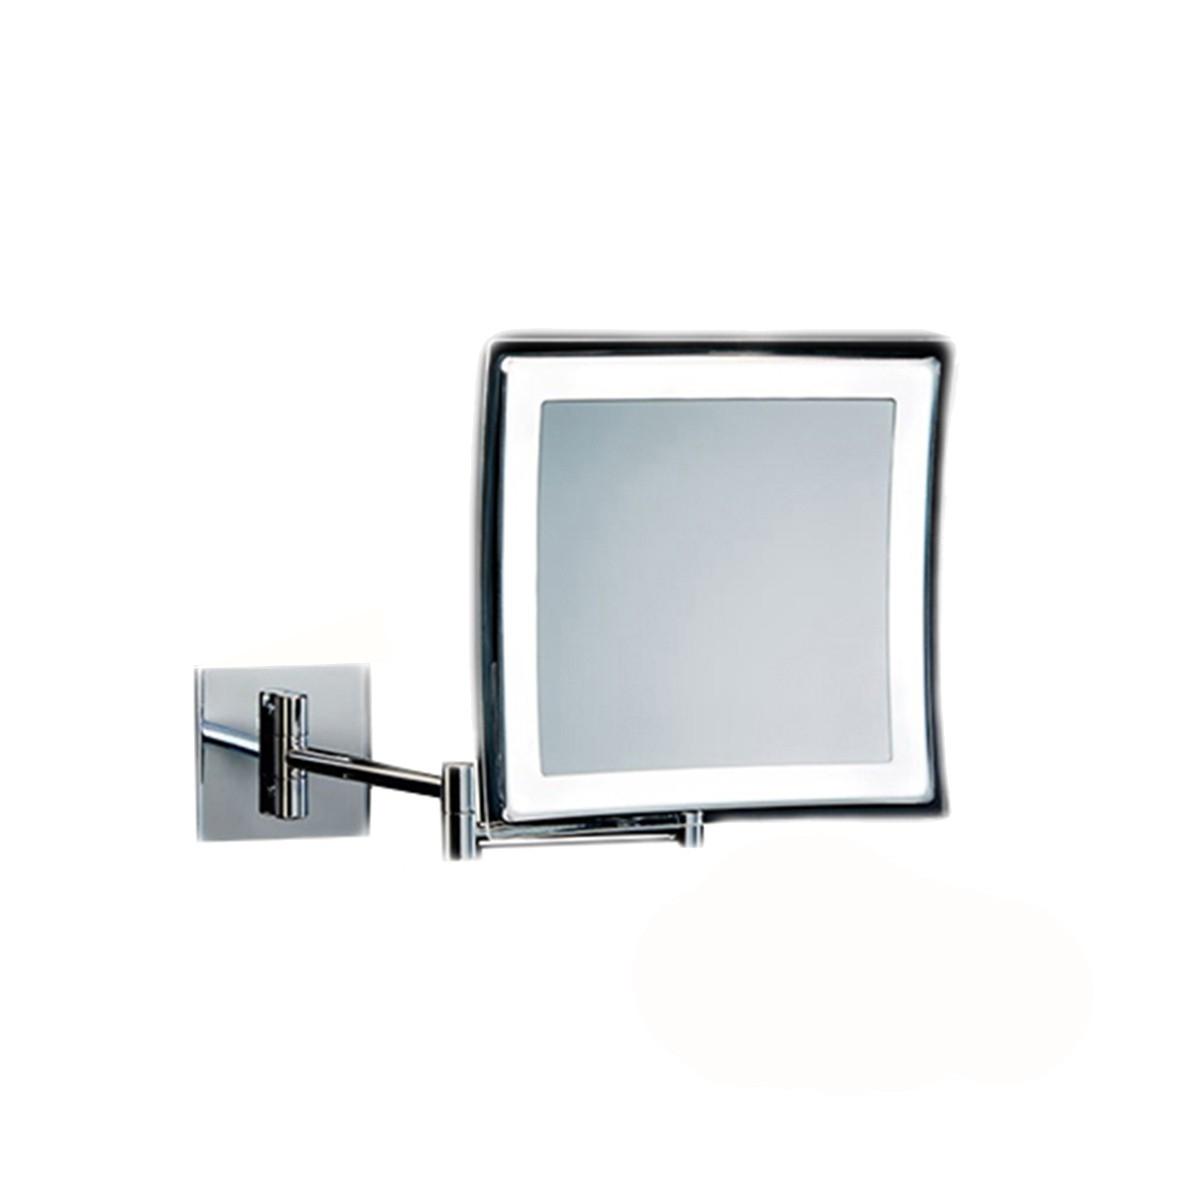 High End Wall Mount Mirror High End Wall Mount Mirror magnifying mirrors high end bathroom mirrors modo bath 1200 X 1200